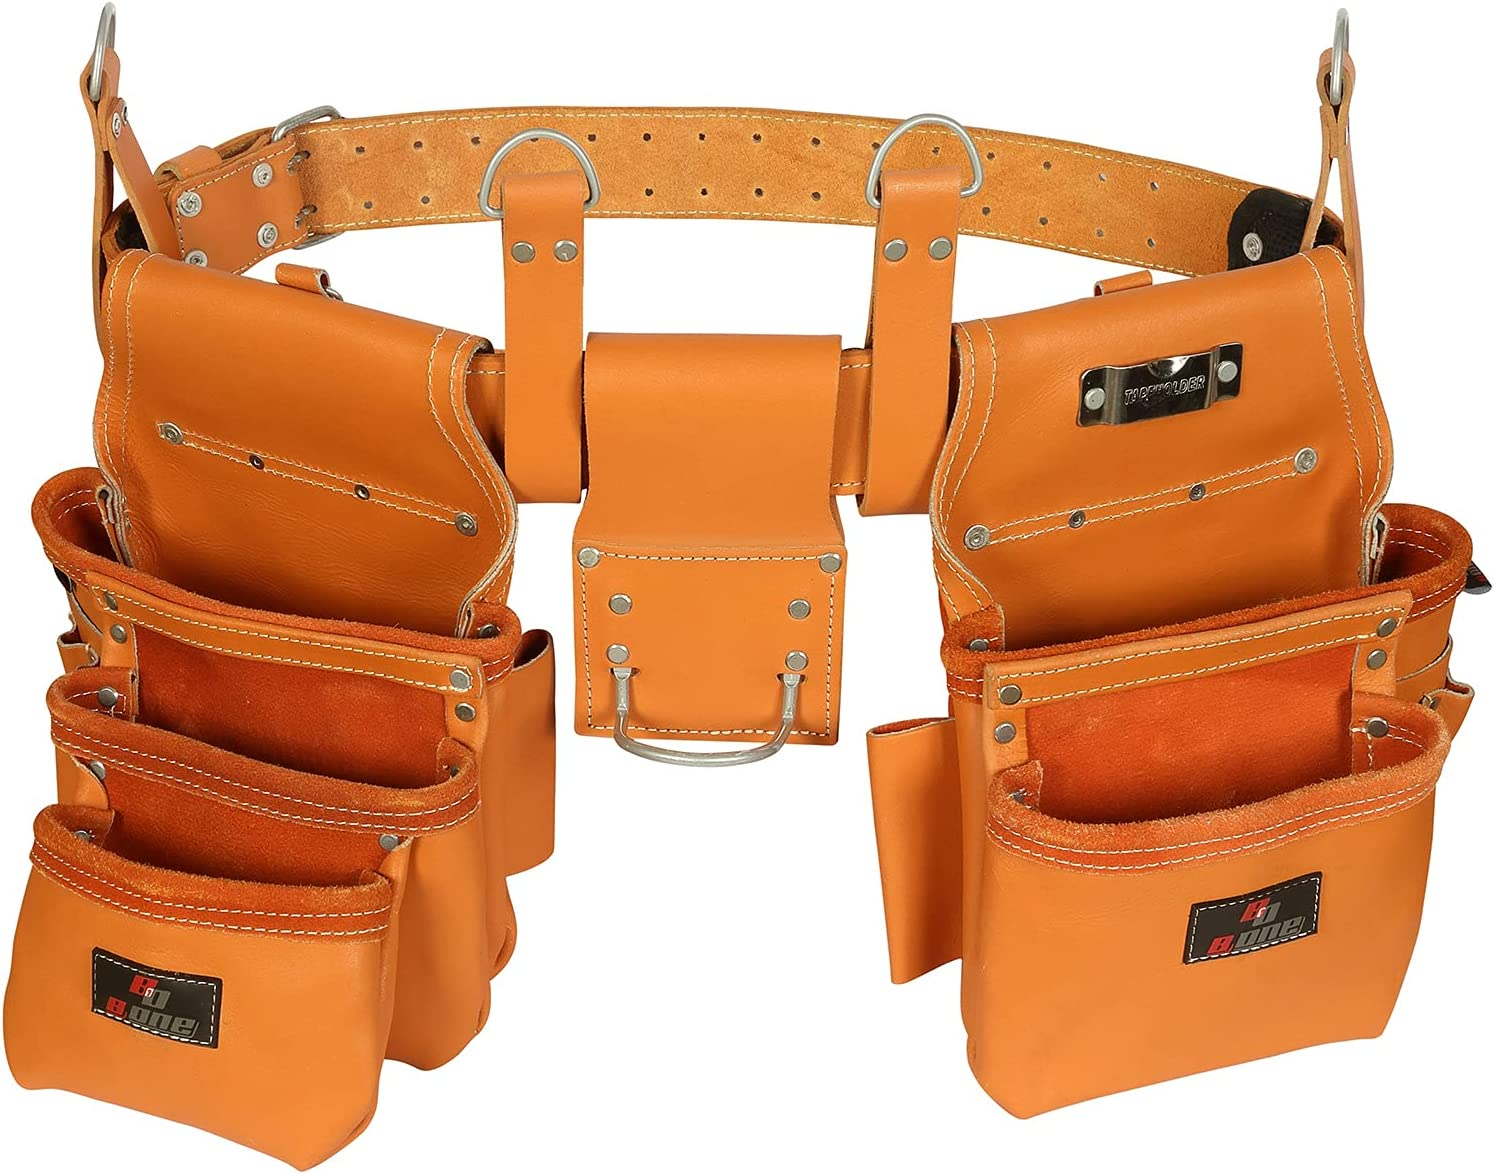 Golden Grain Leather trust Carpenter Tool Belt Daily bargain sale Pouch Bag Rig Se